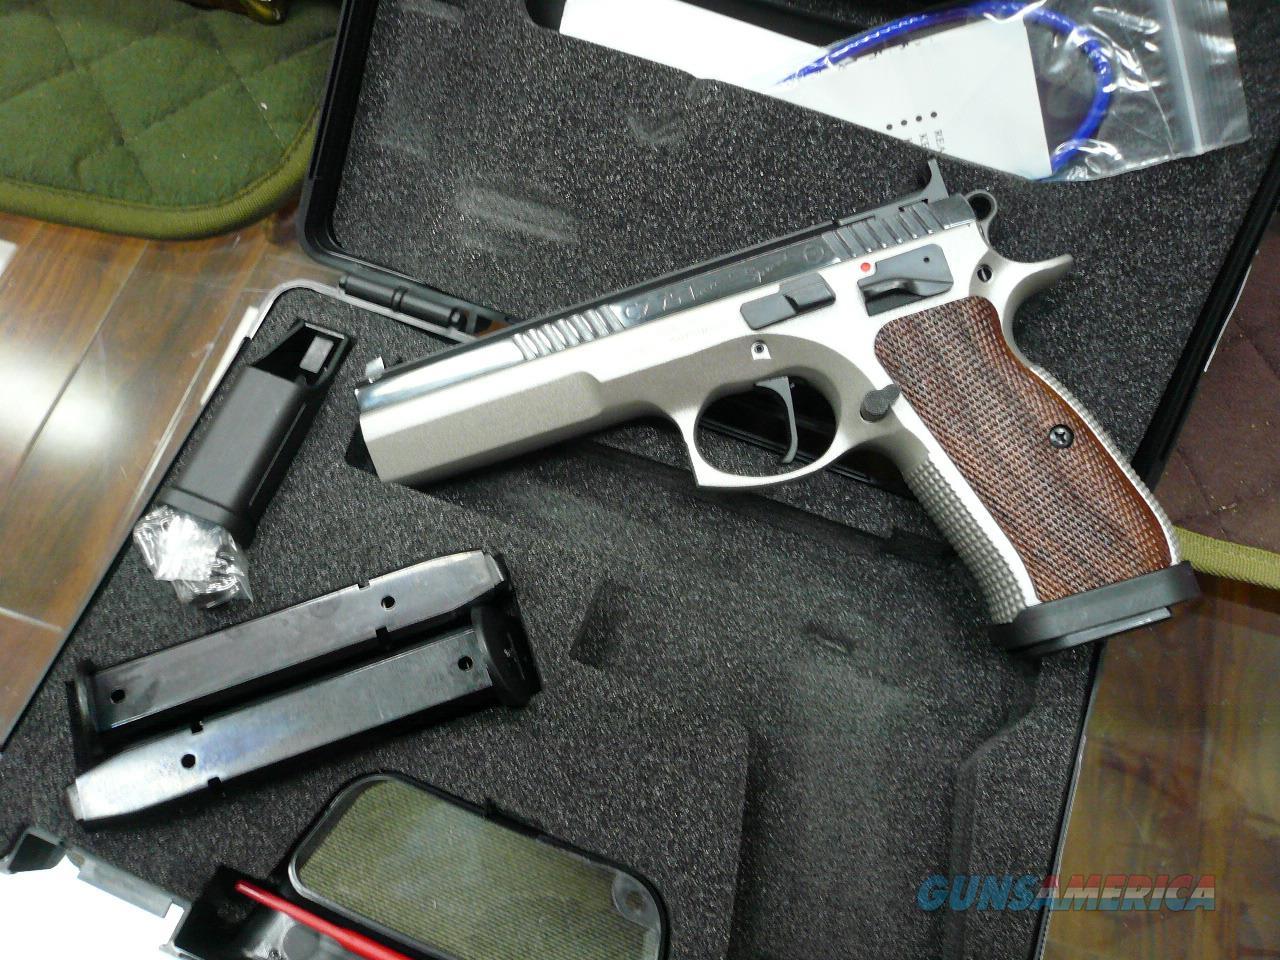 CZ75/TACTICAL SPORT 9MM NIB  Guns > Pistols > CZ Pistols